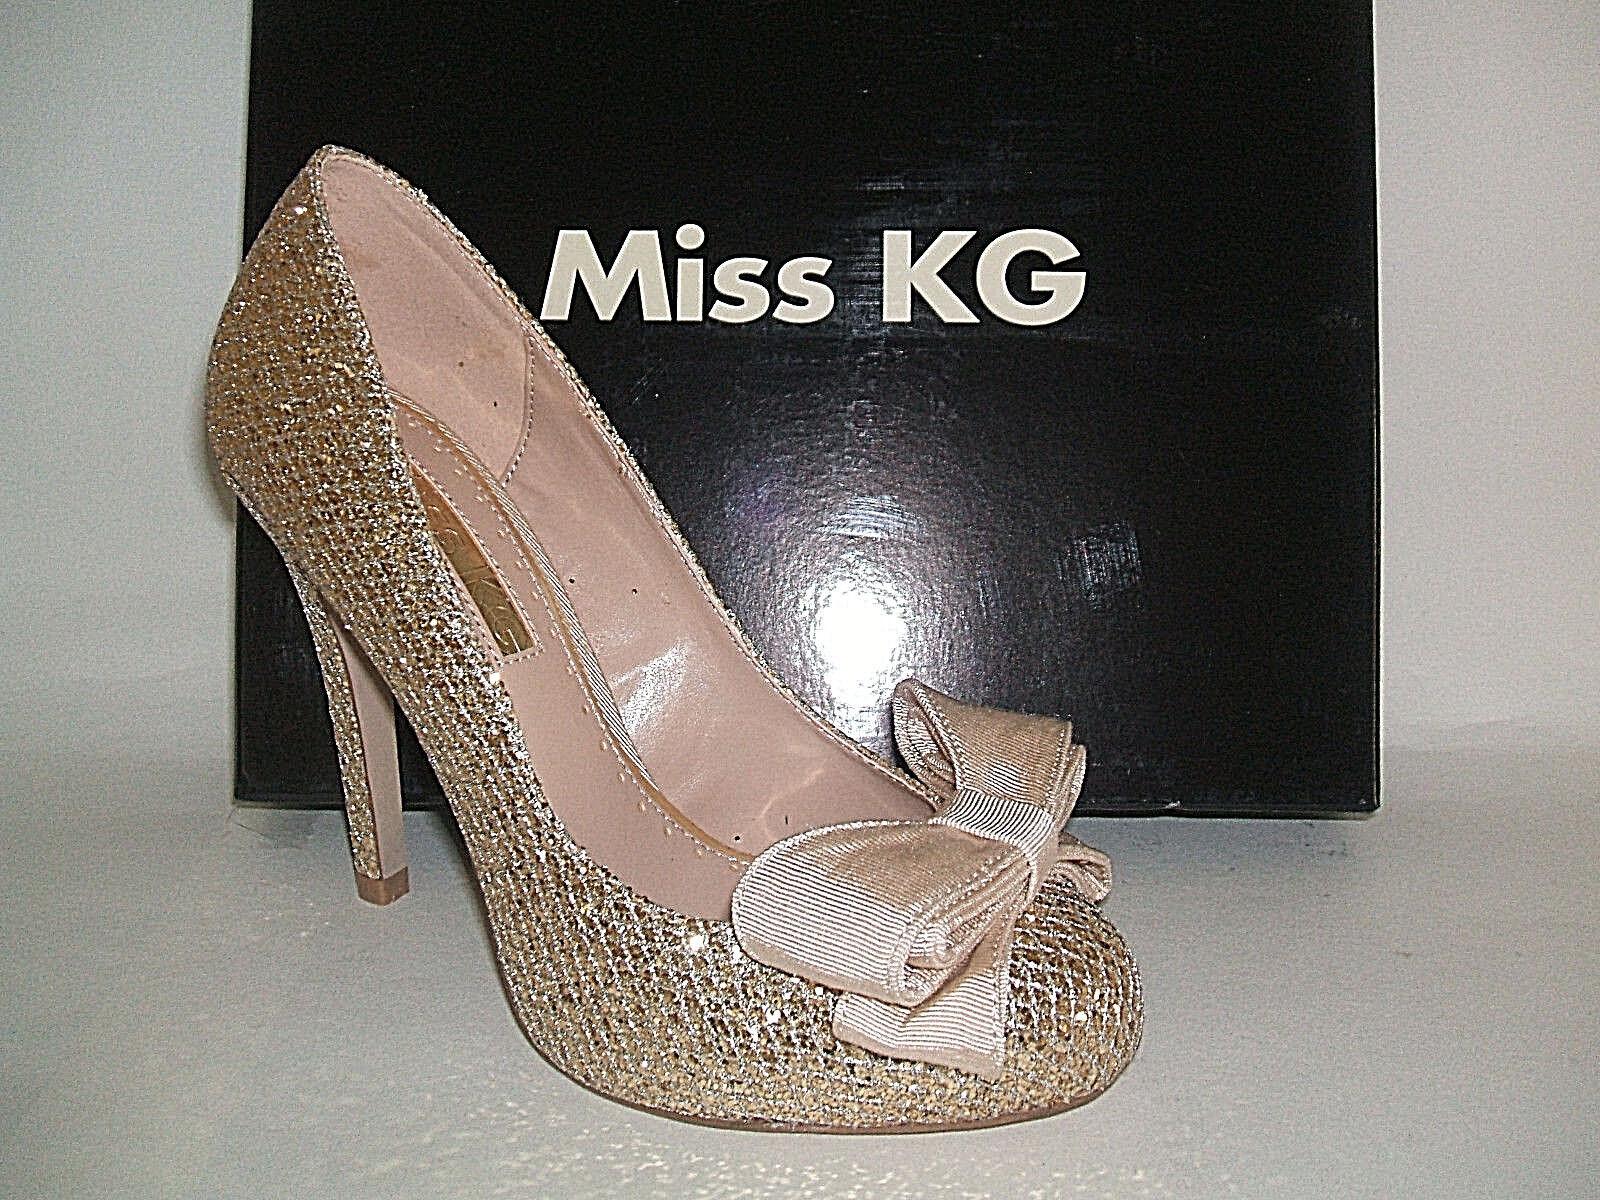 MISS KG SIZE 3 4 5 6 7 GEM GOLD GOLD GEM GLITTER BEIGE BOW OCCASION COURT Schuhe c47d68